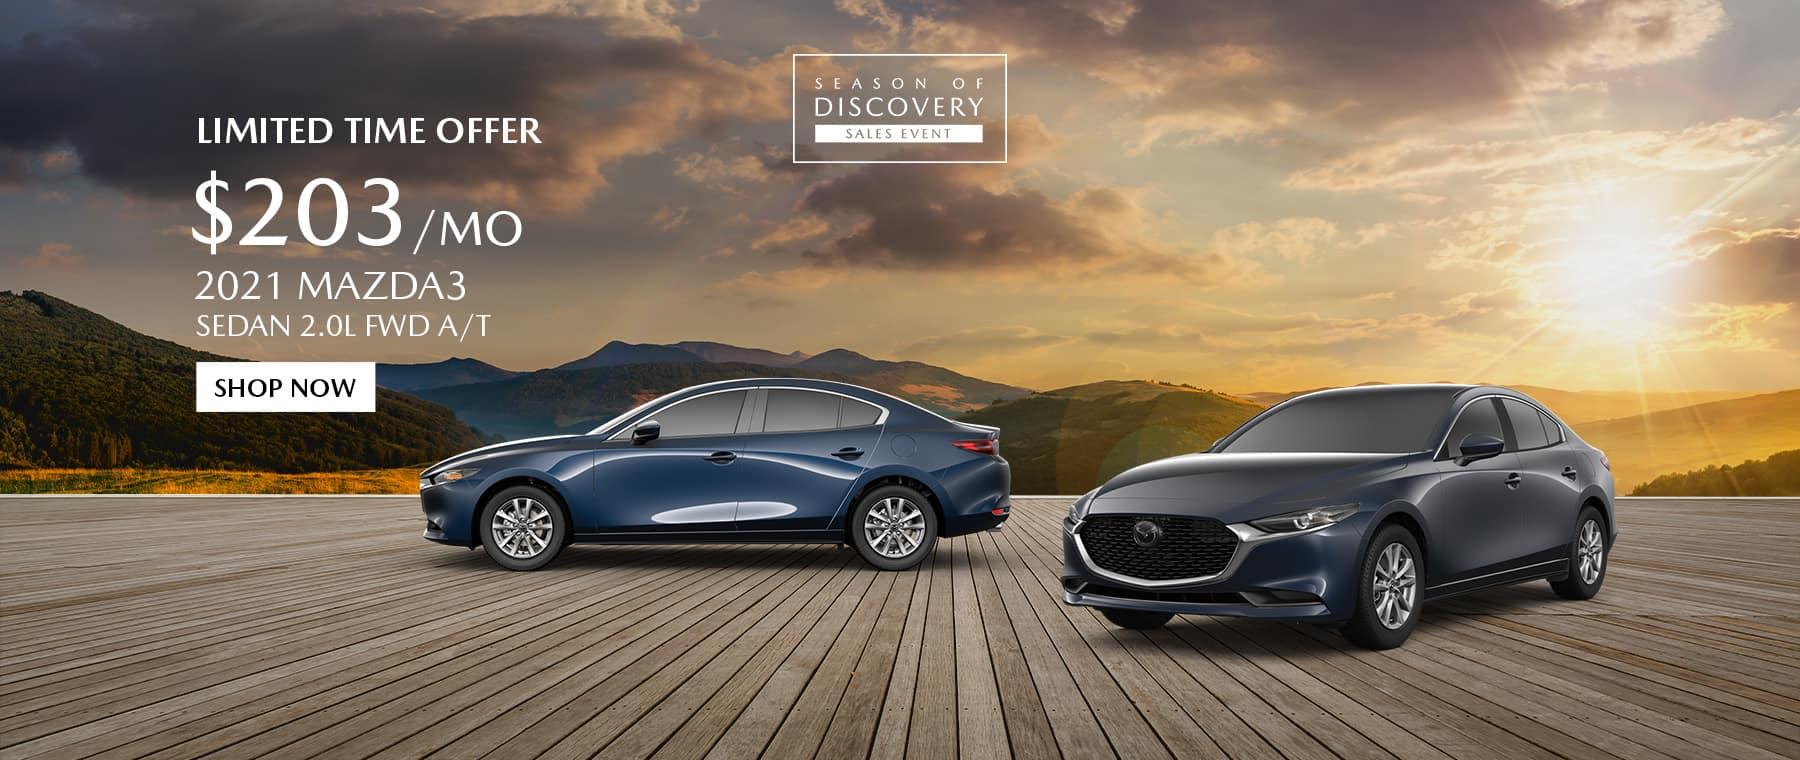 2021 Mazda 3 Special Offer